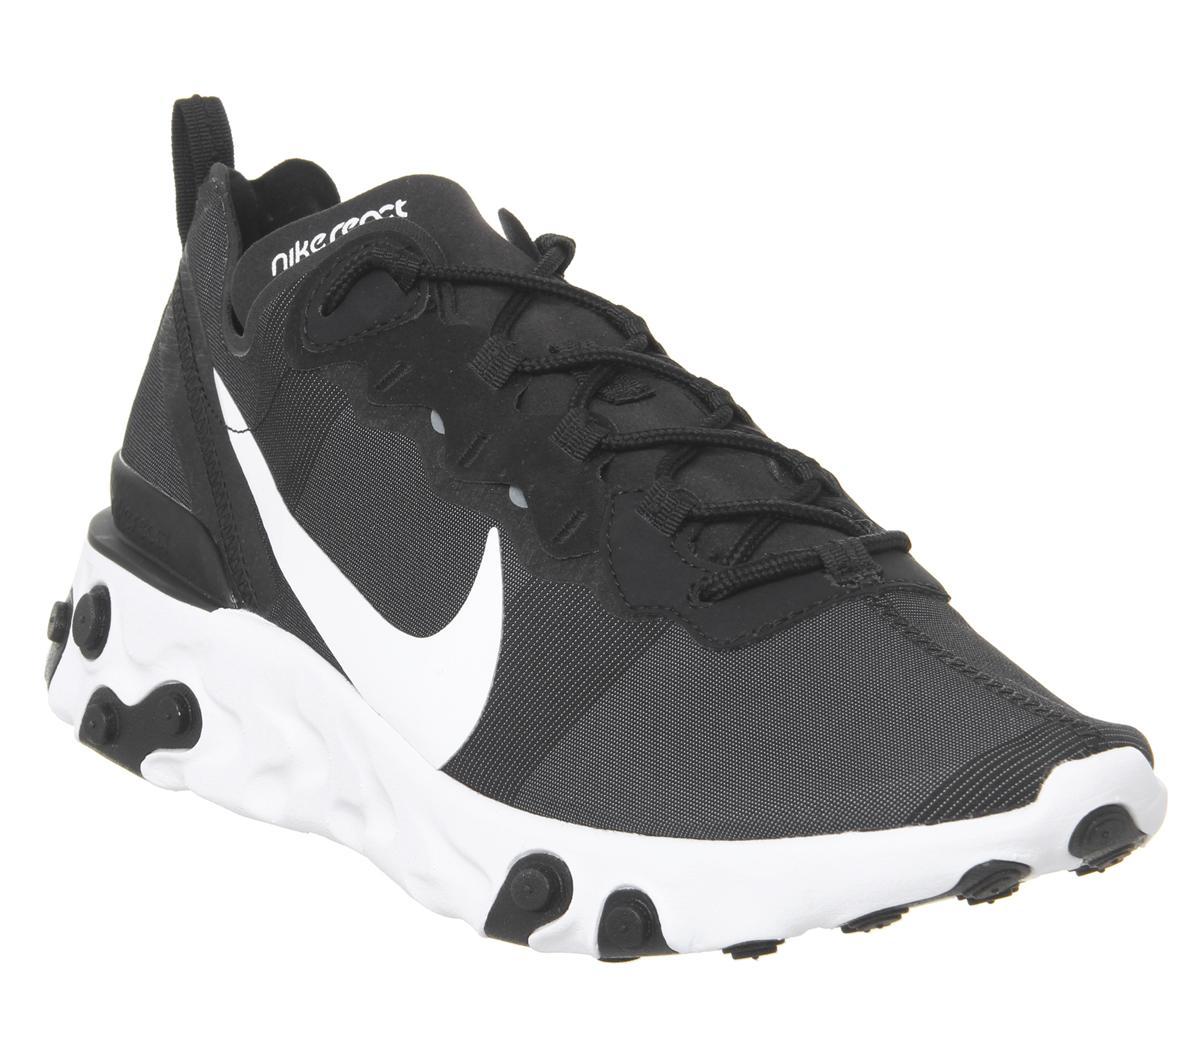 Nike React Element 55 Trainers Black